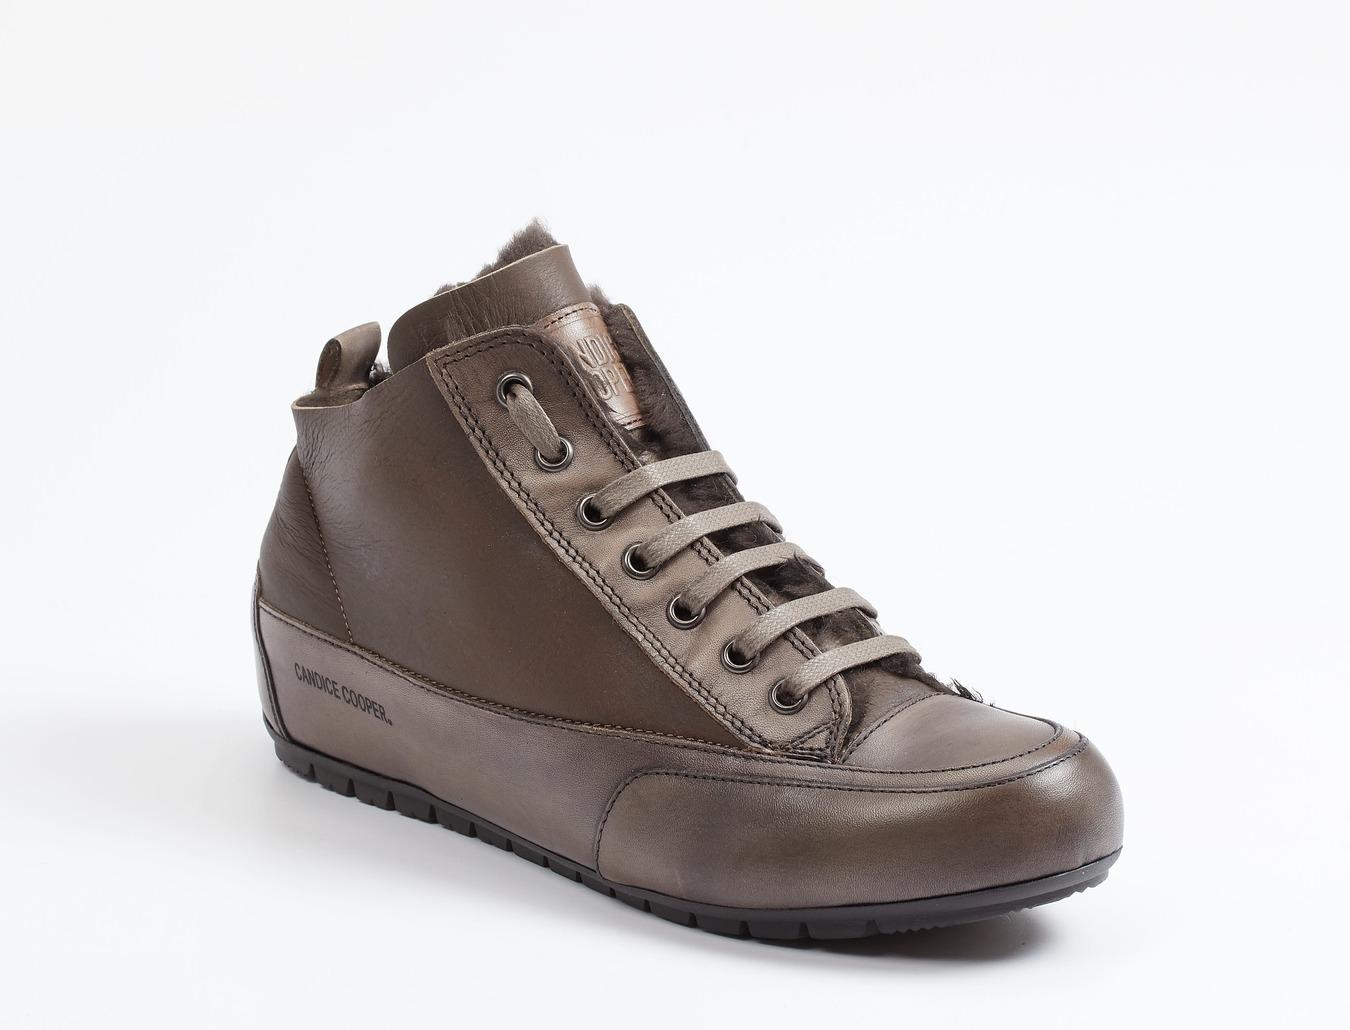 Candice Cooper Damen Winter-Boot in